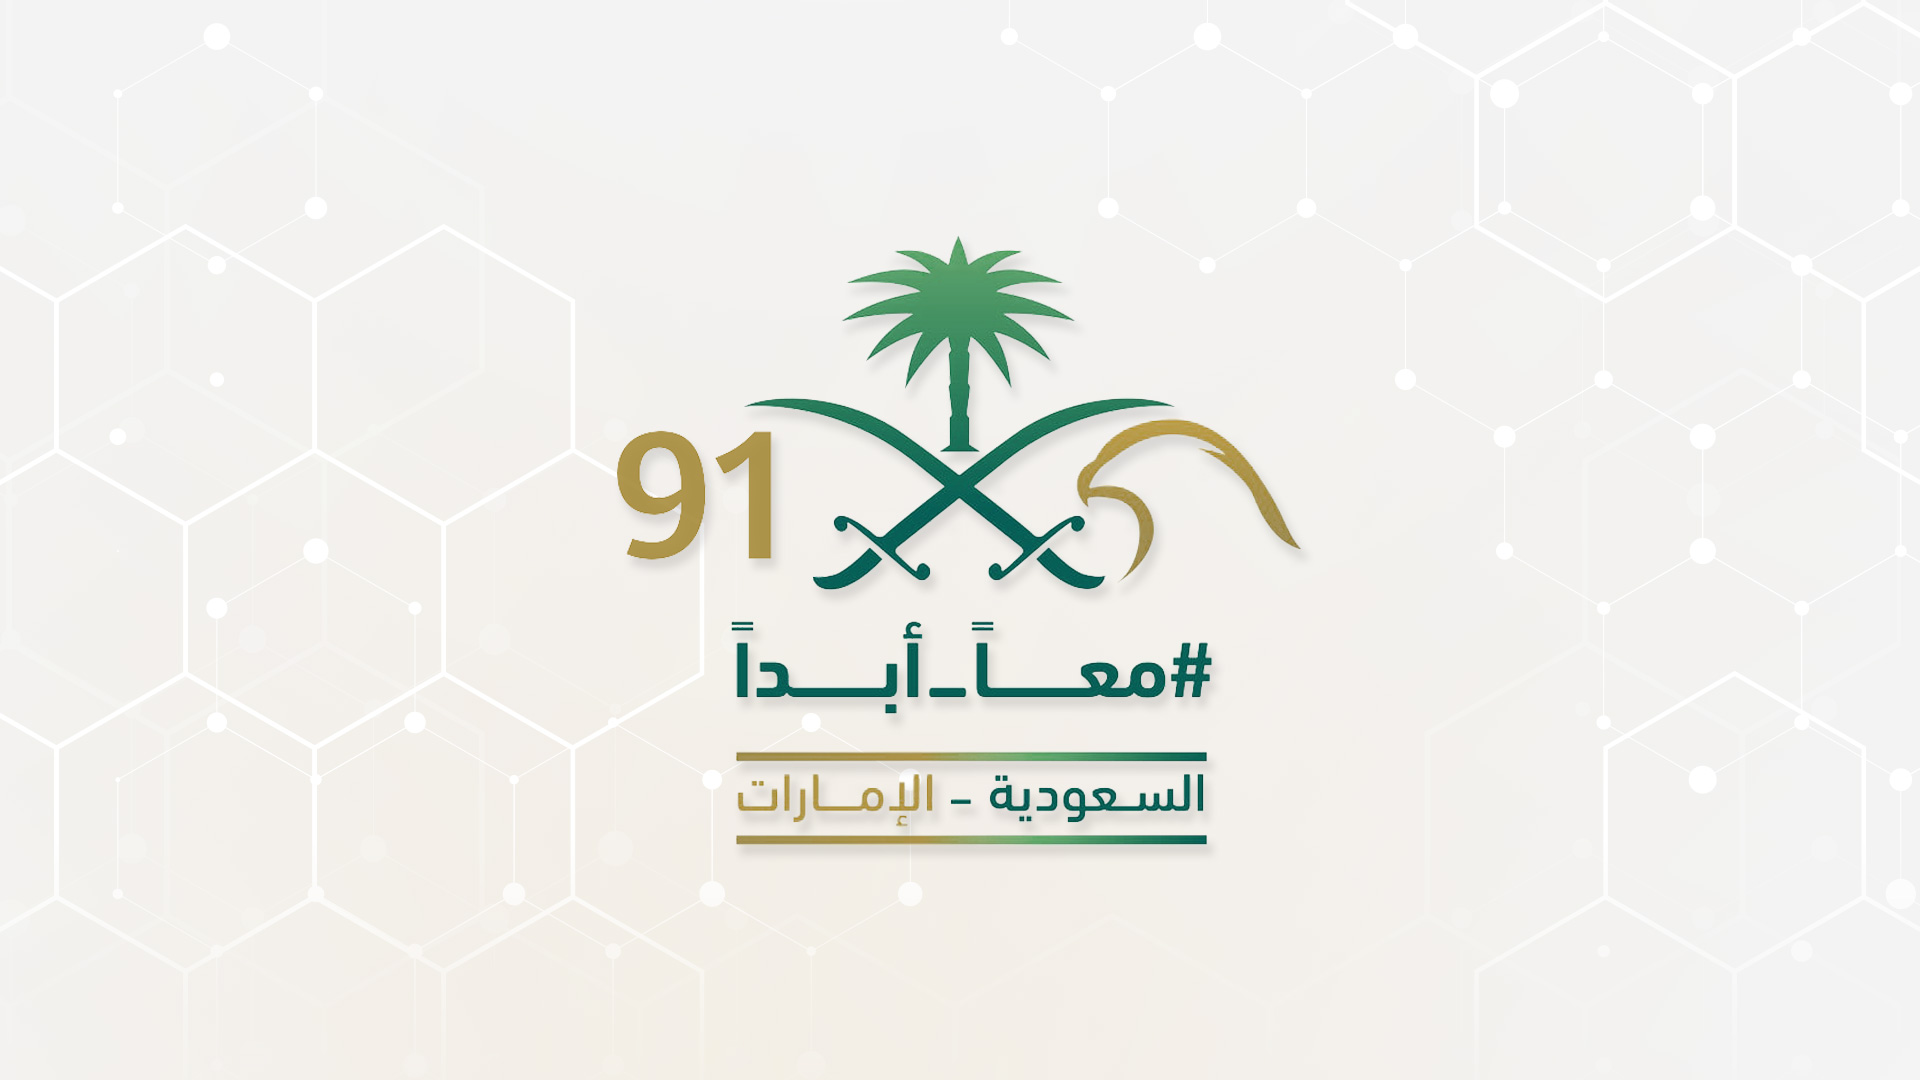 Saudi National Day (Saudi Arabia - UAE #Together_Forever)